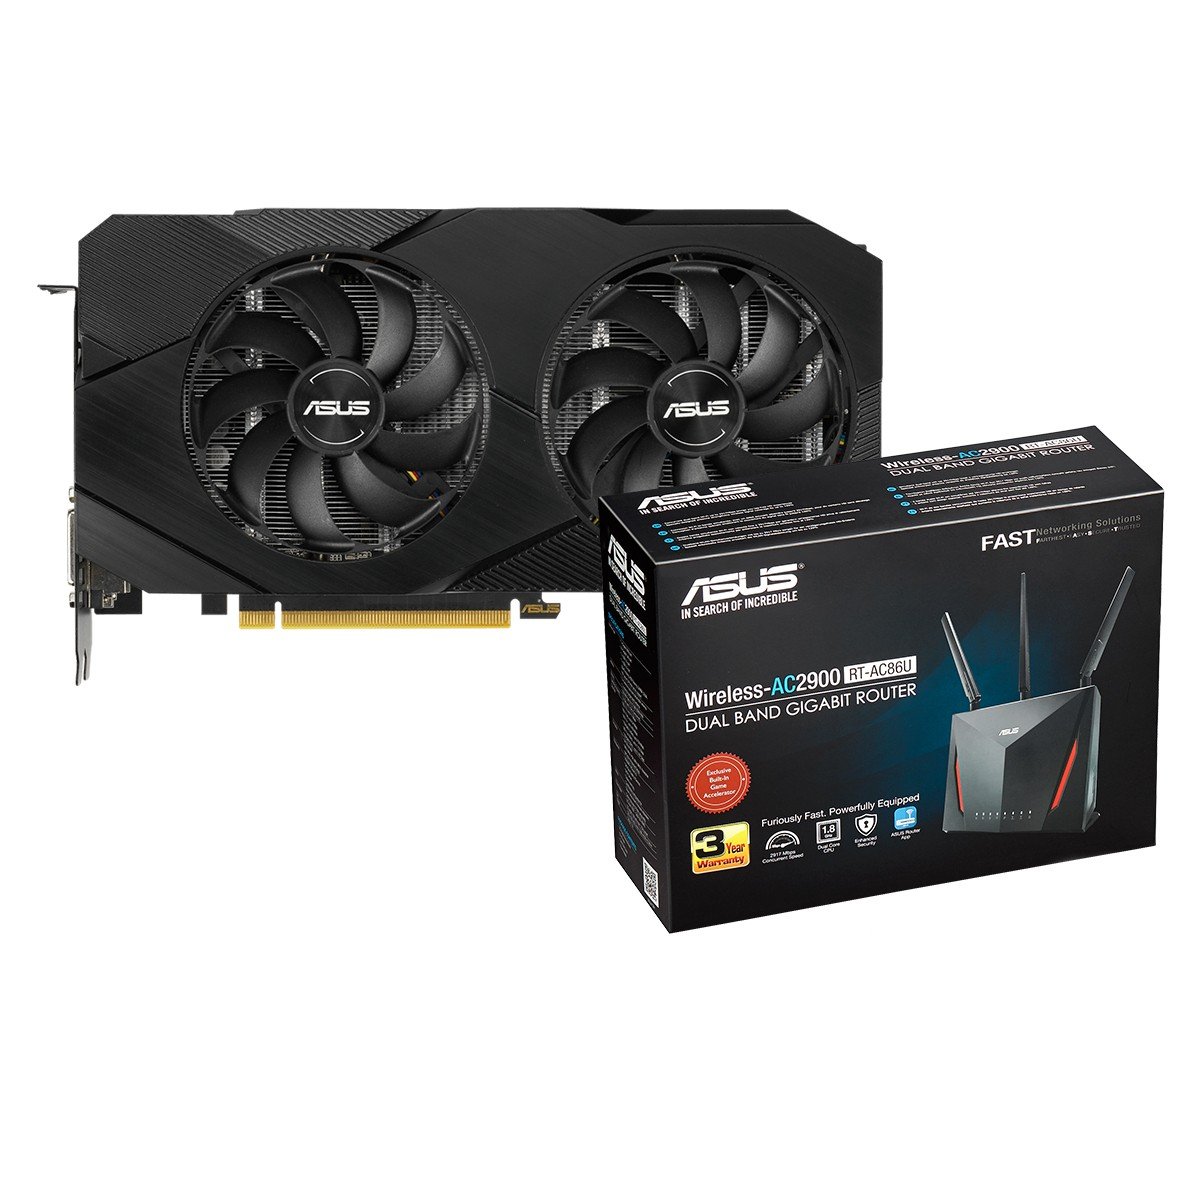 Kit Upgrade ASUS GeForce RTX 2060 OC EVO Dual + ASUS RT-AC86U